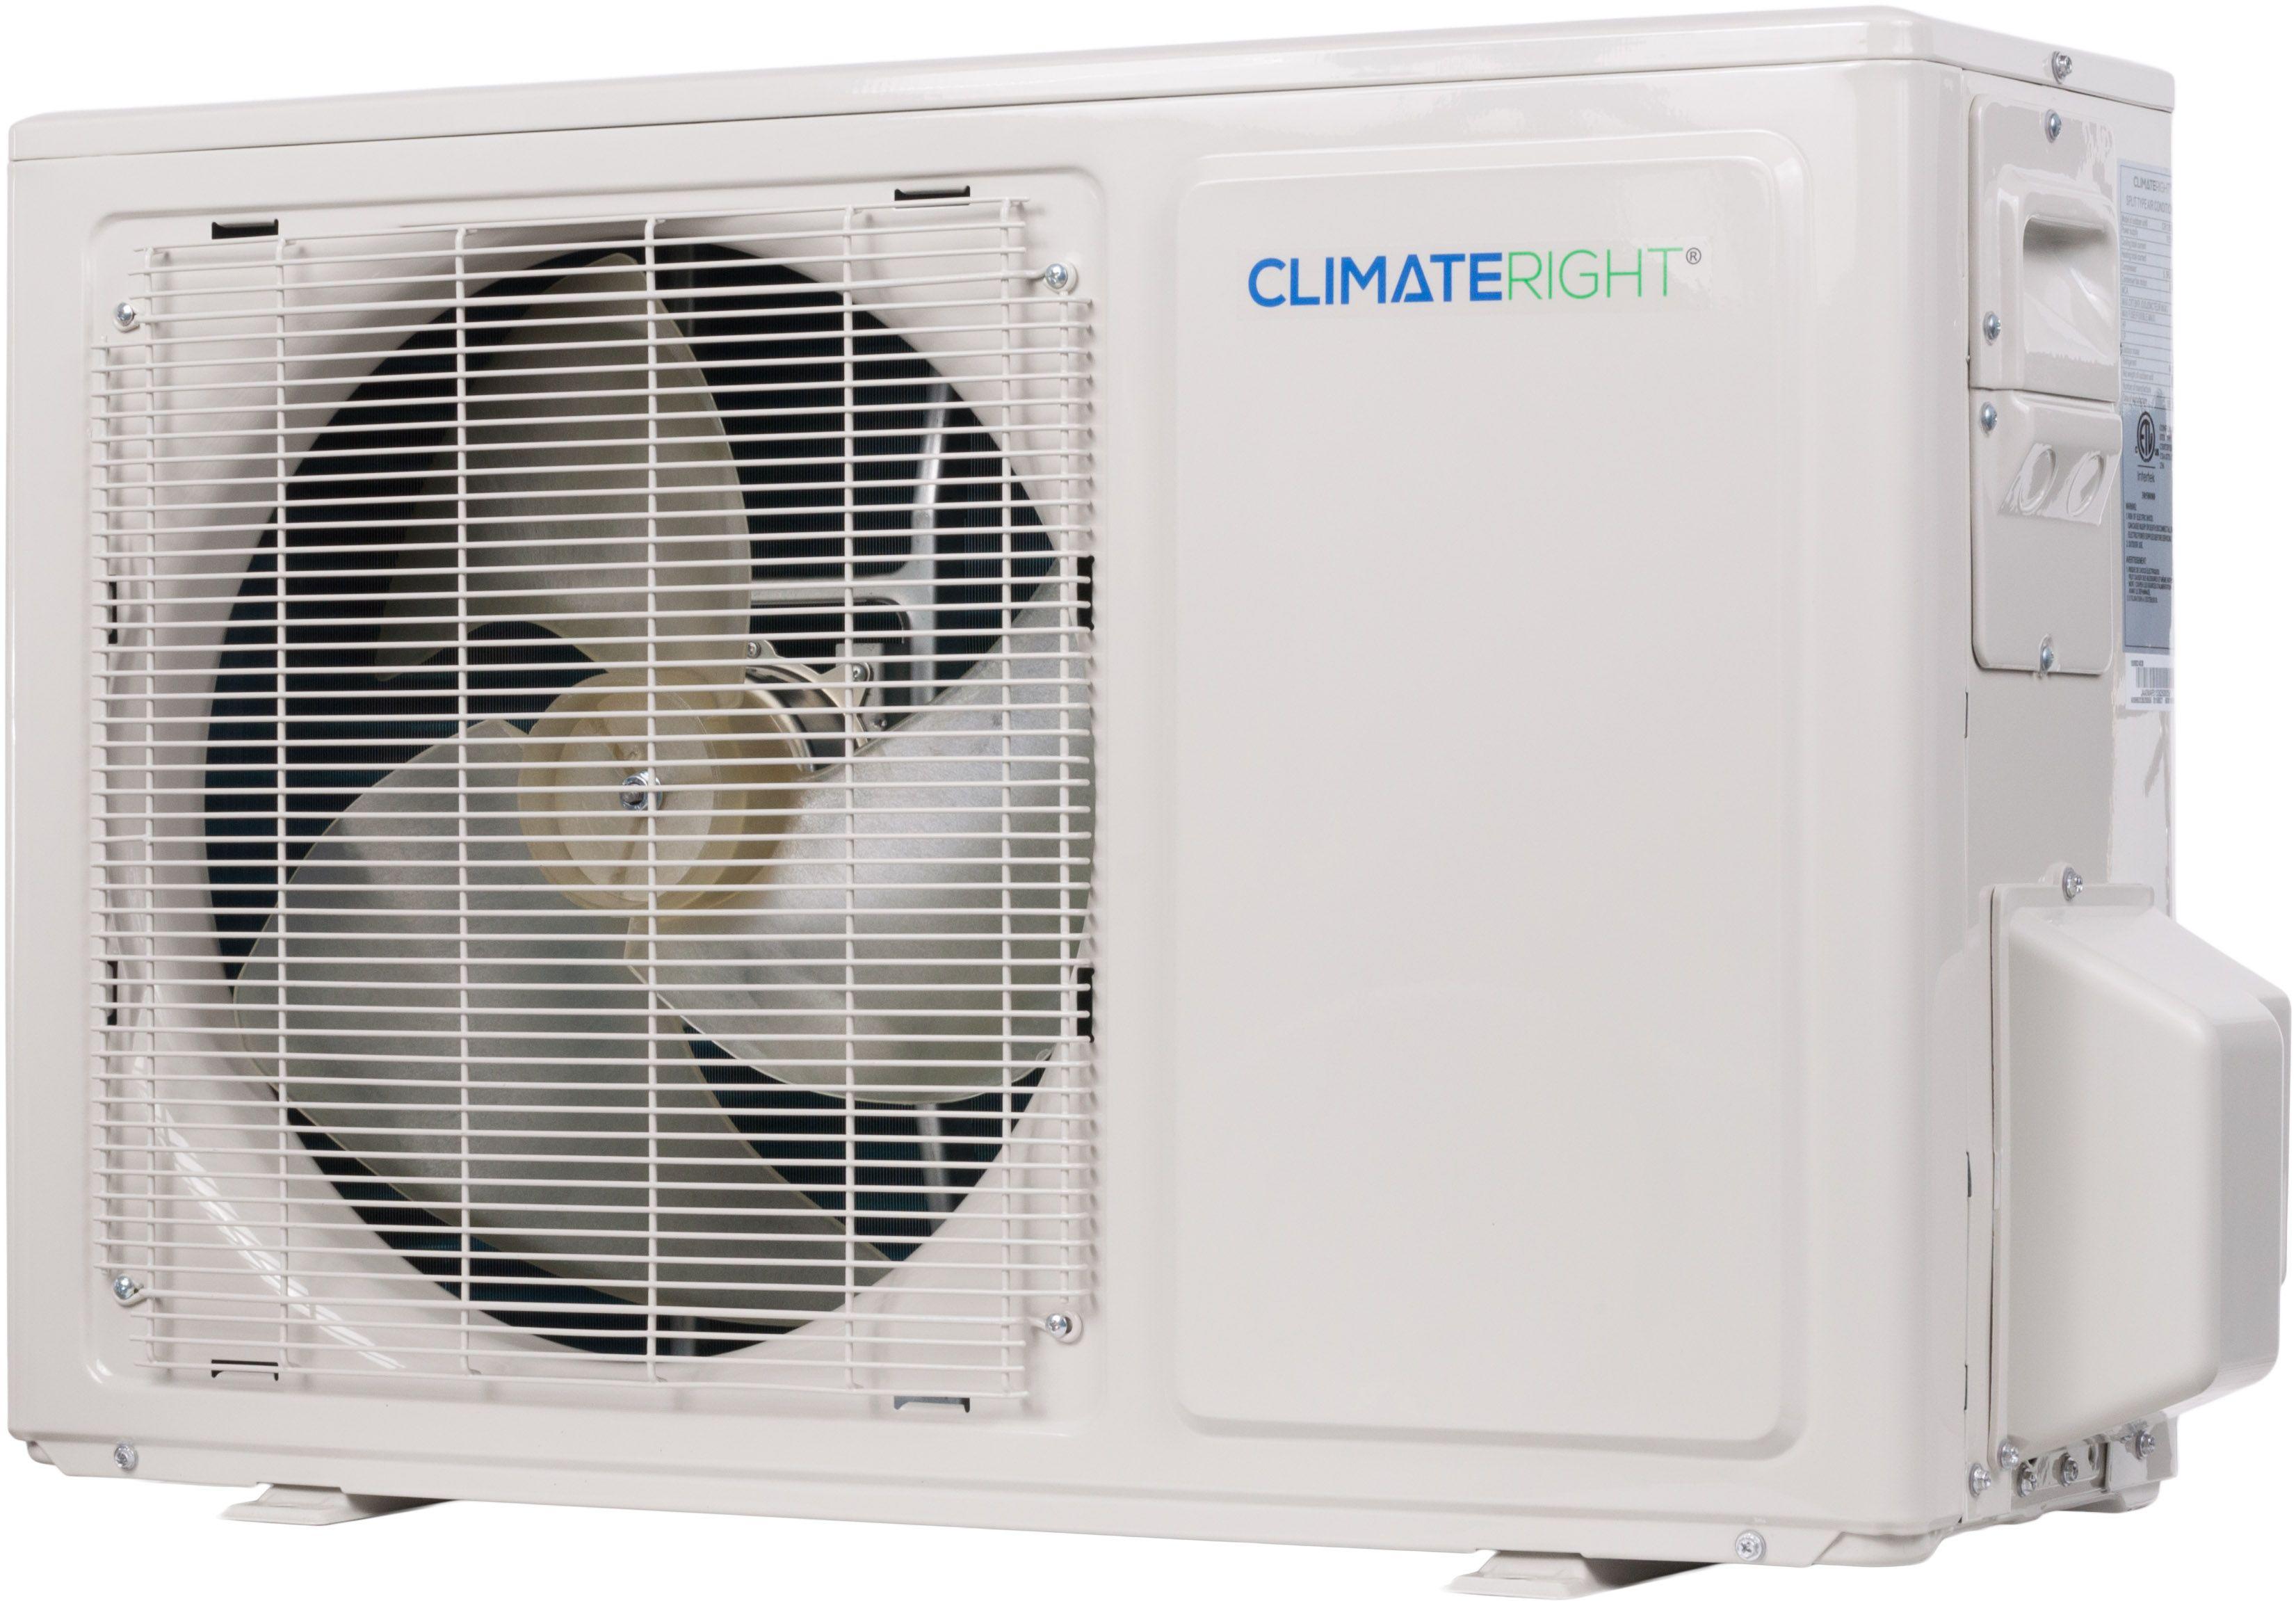 Climateright 4000 to 120000 btu quick connect diy mini